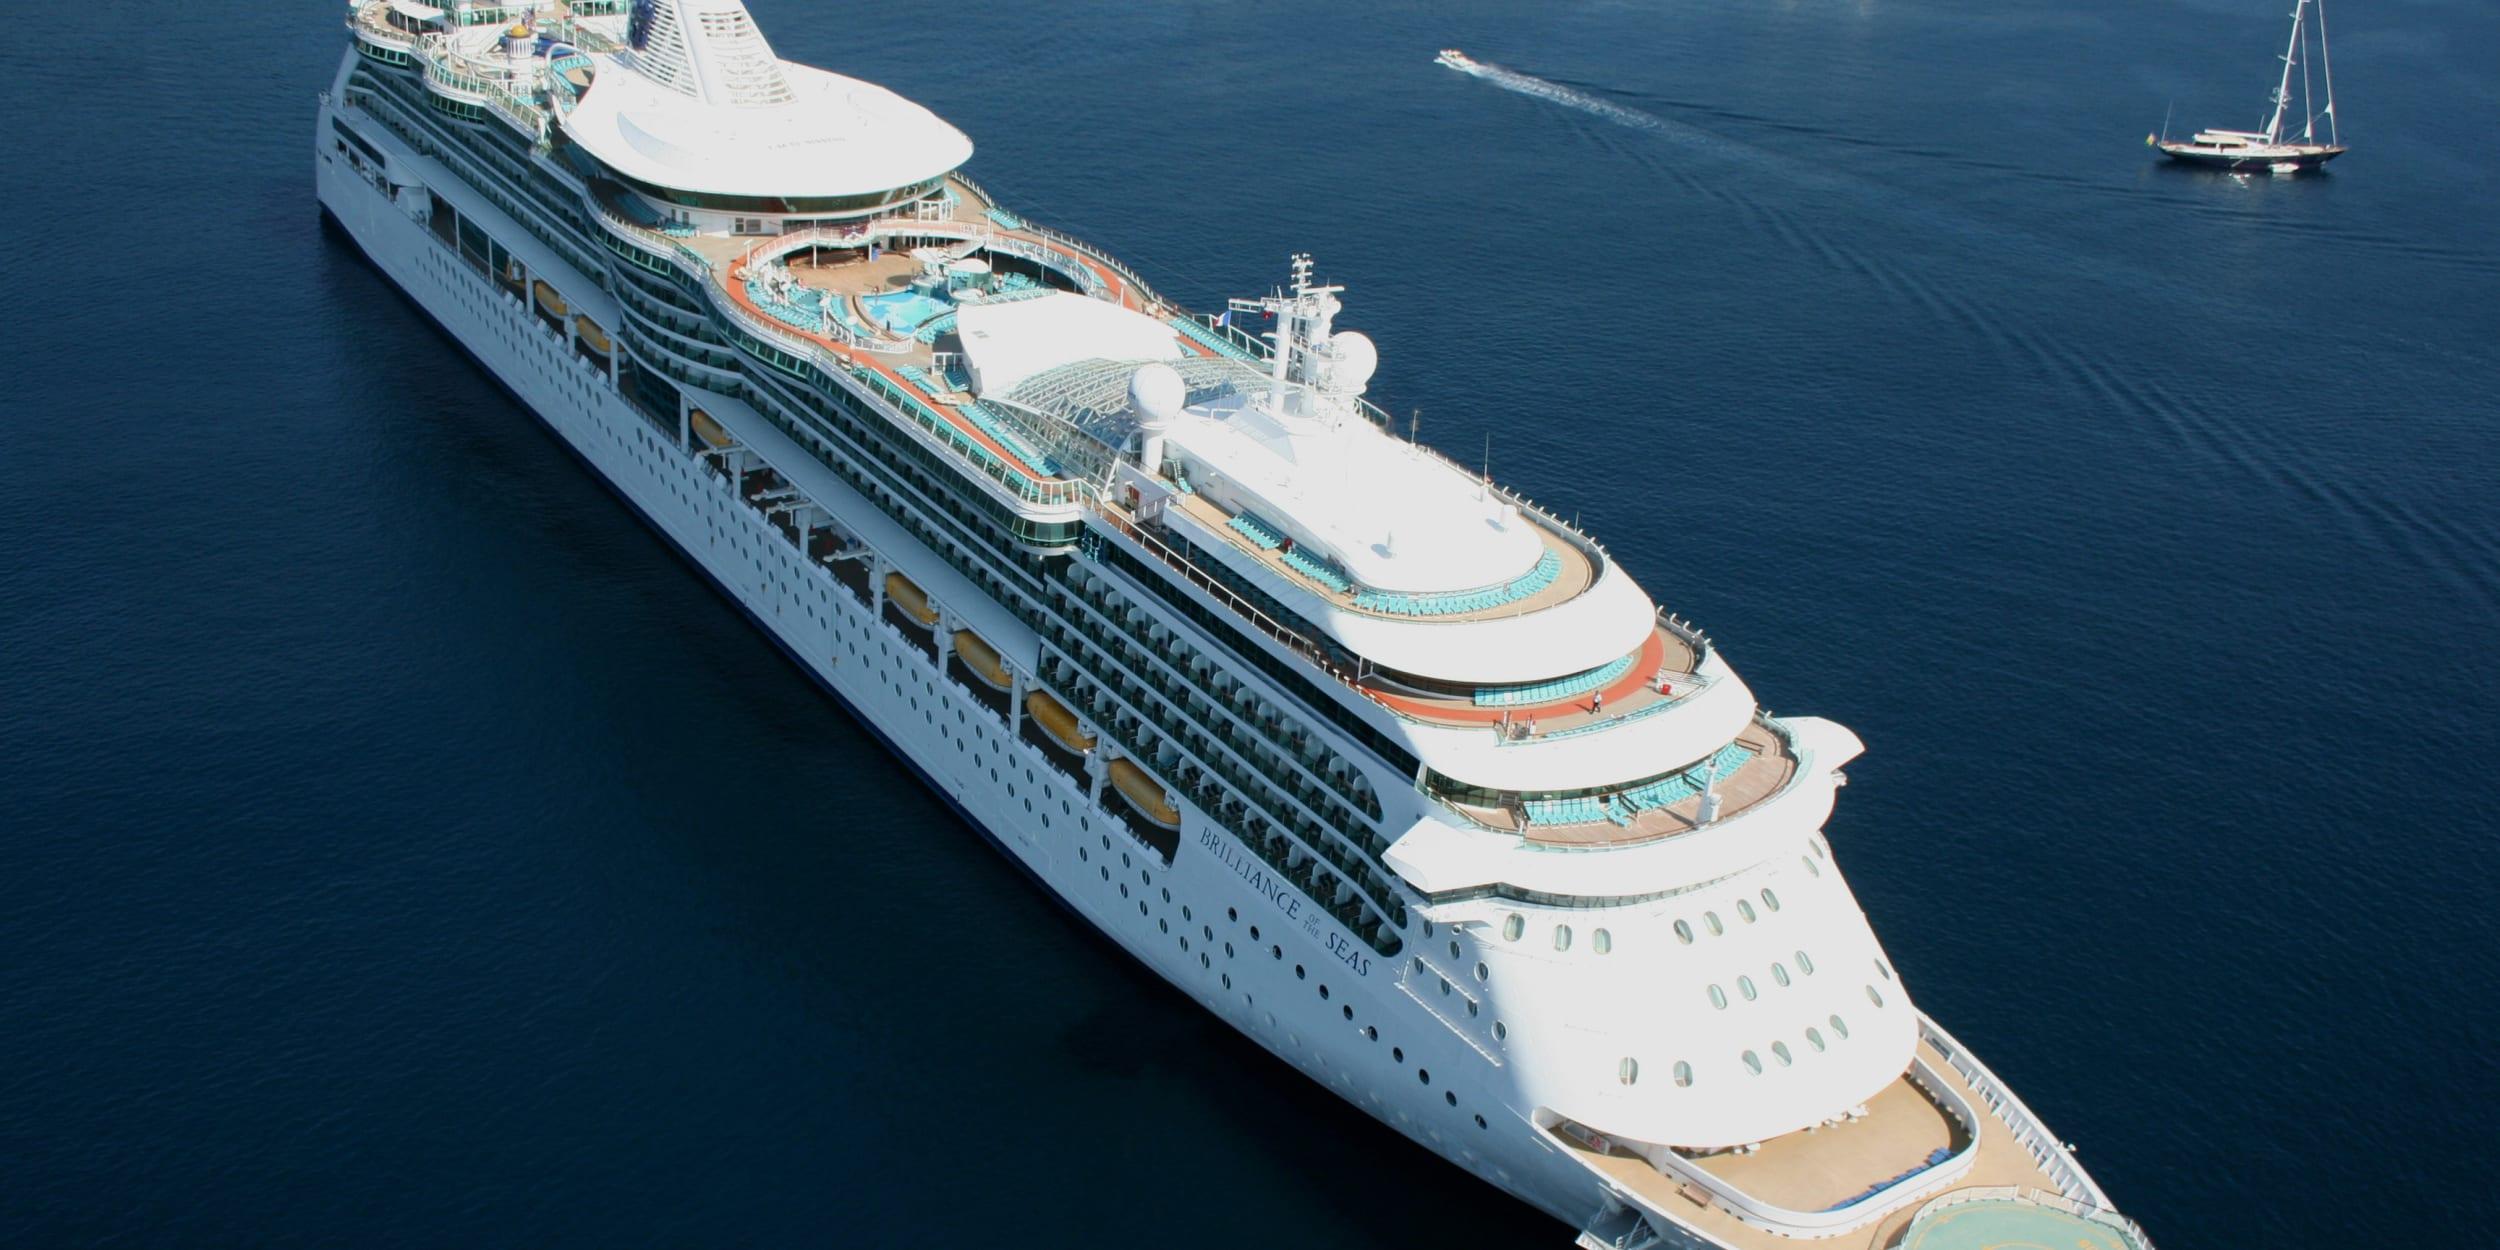 Cruise - Maritime Transport of Passengers